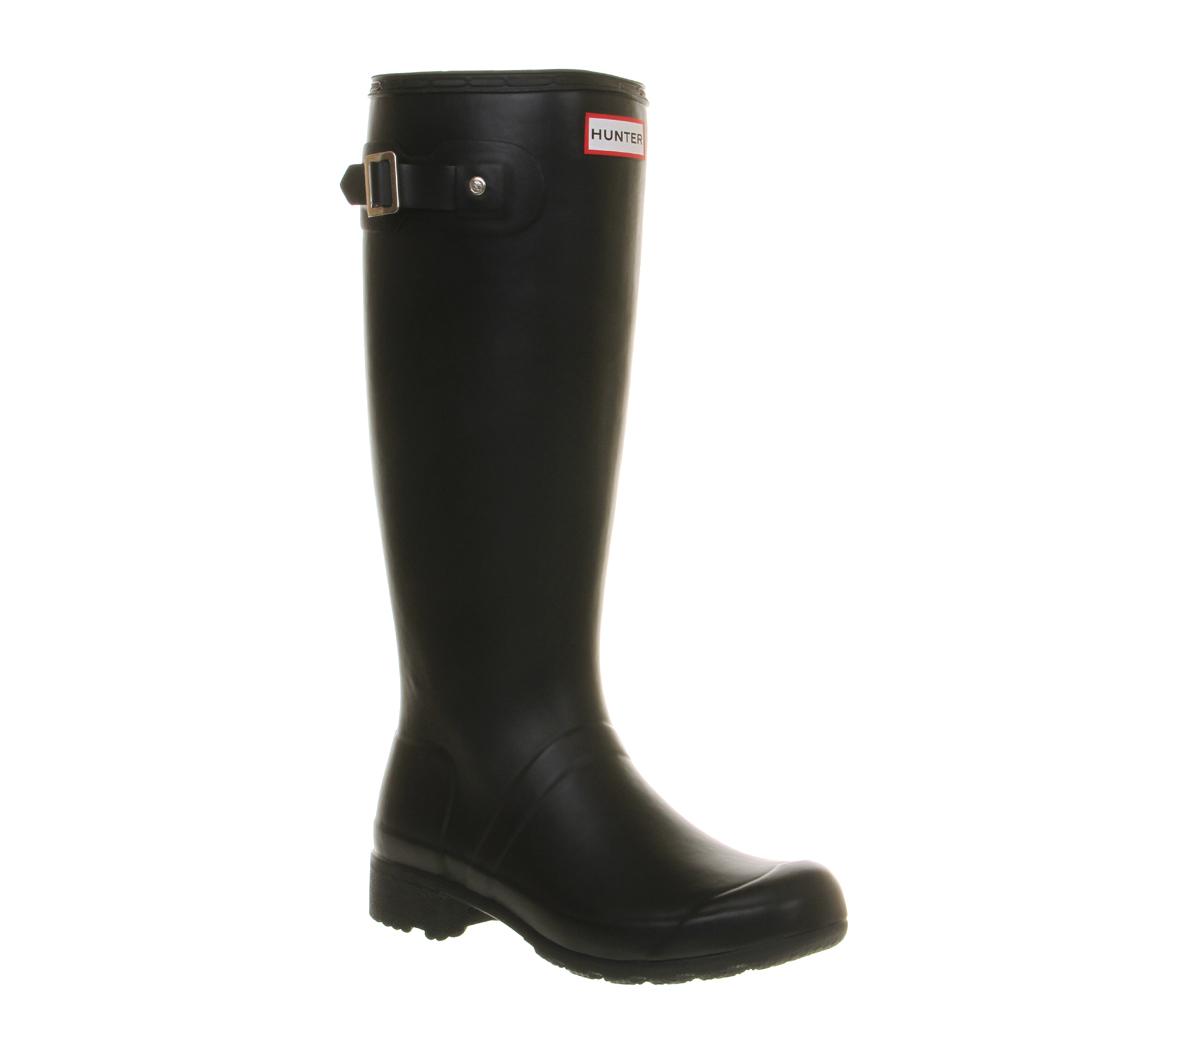 Simple Hunter Original Tall Gloss Rain Boot For Women  Fawaa